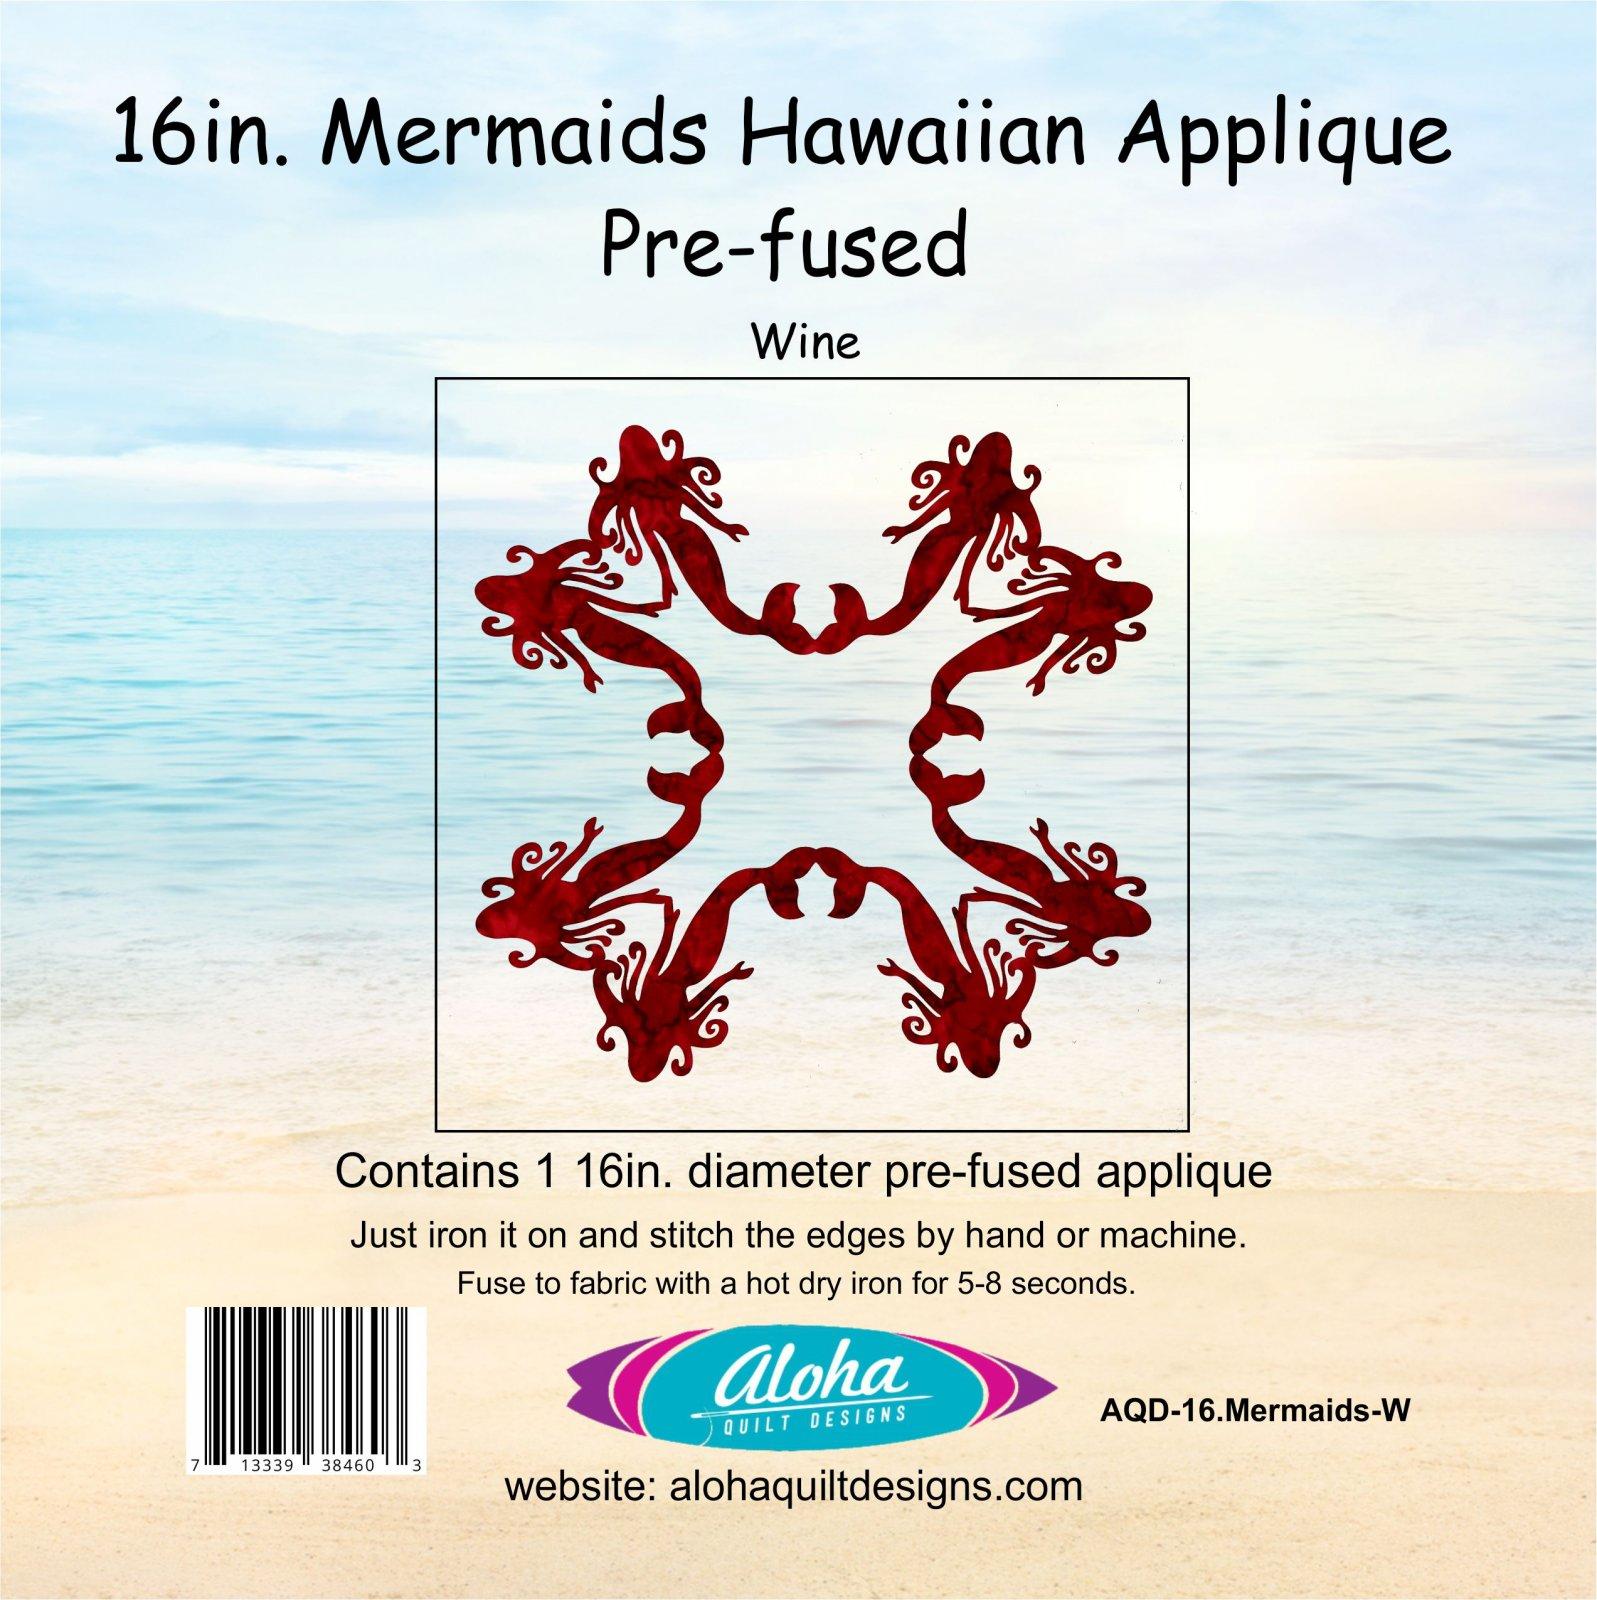 16in. Mermaids Fusible Applique